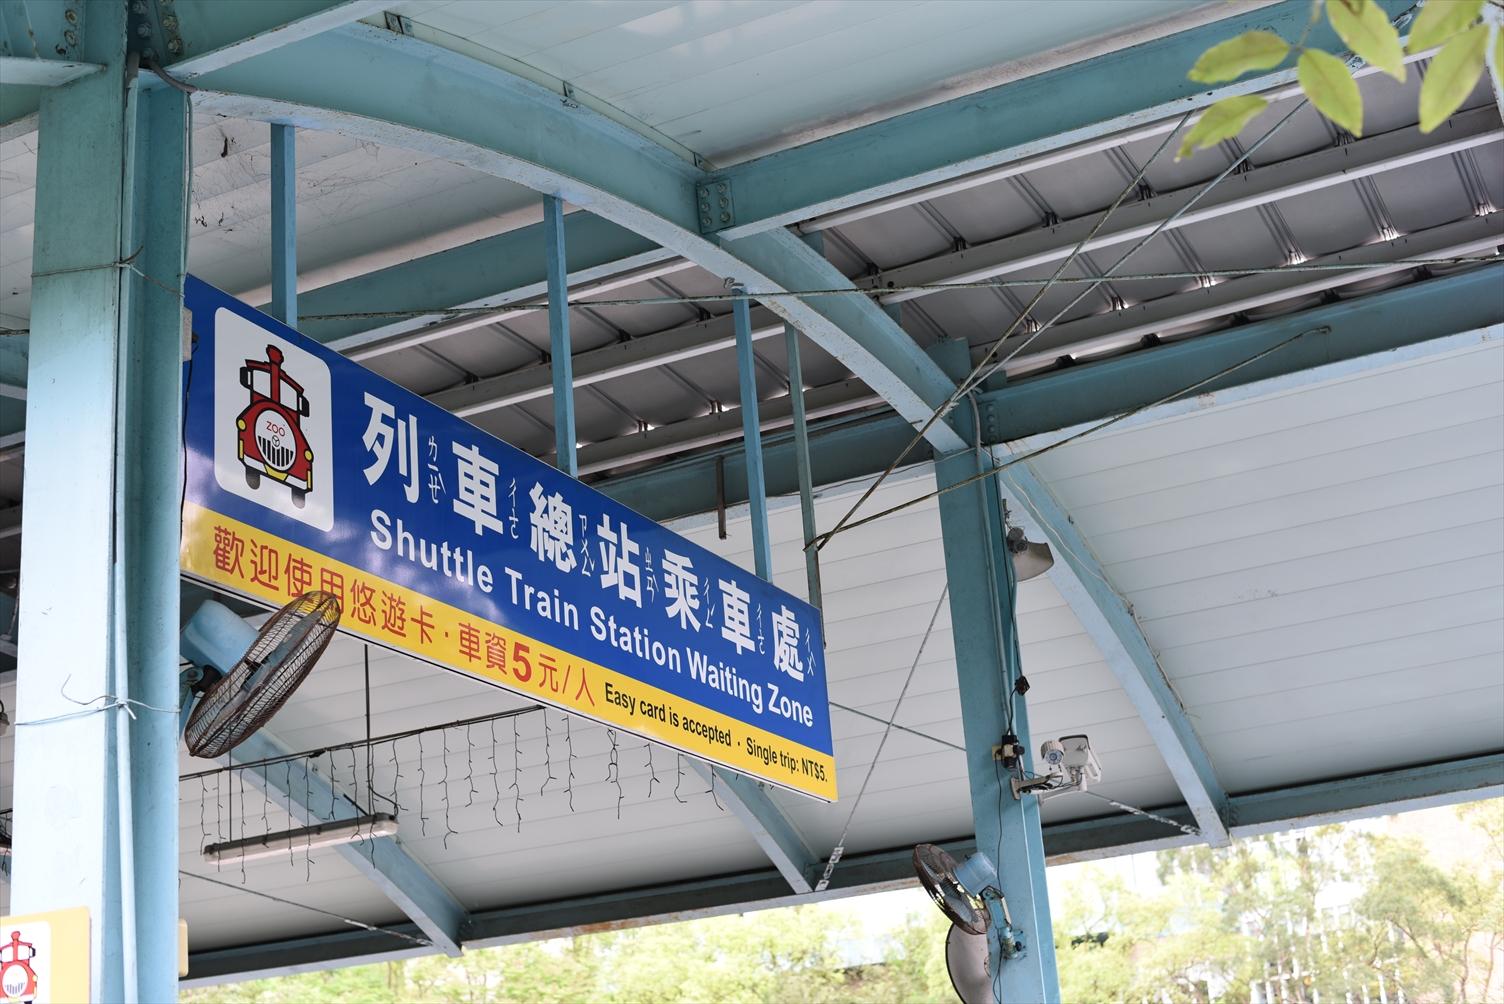 台北市立動物園 シャトル乗場